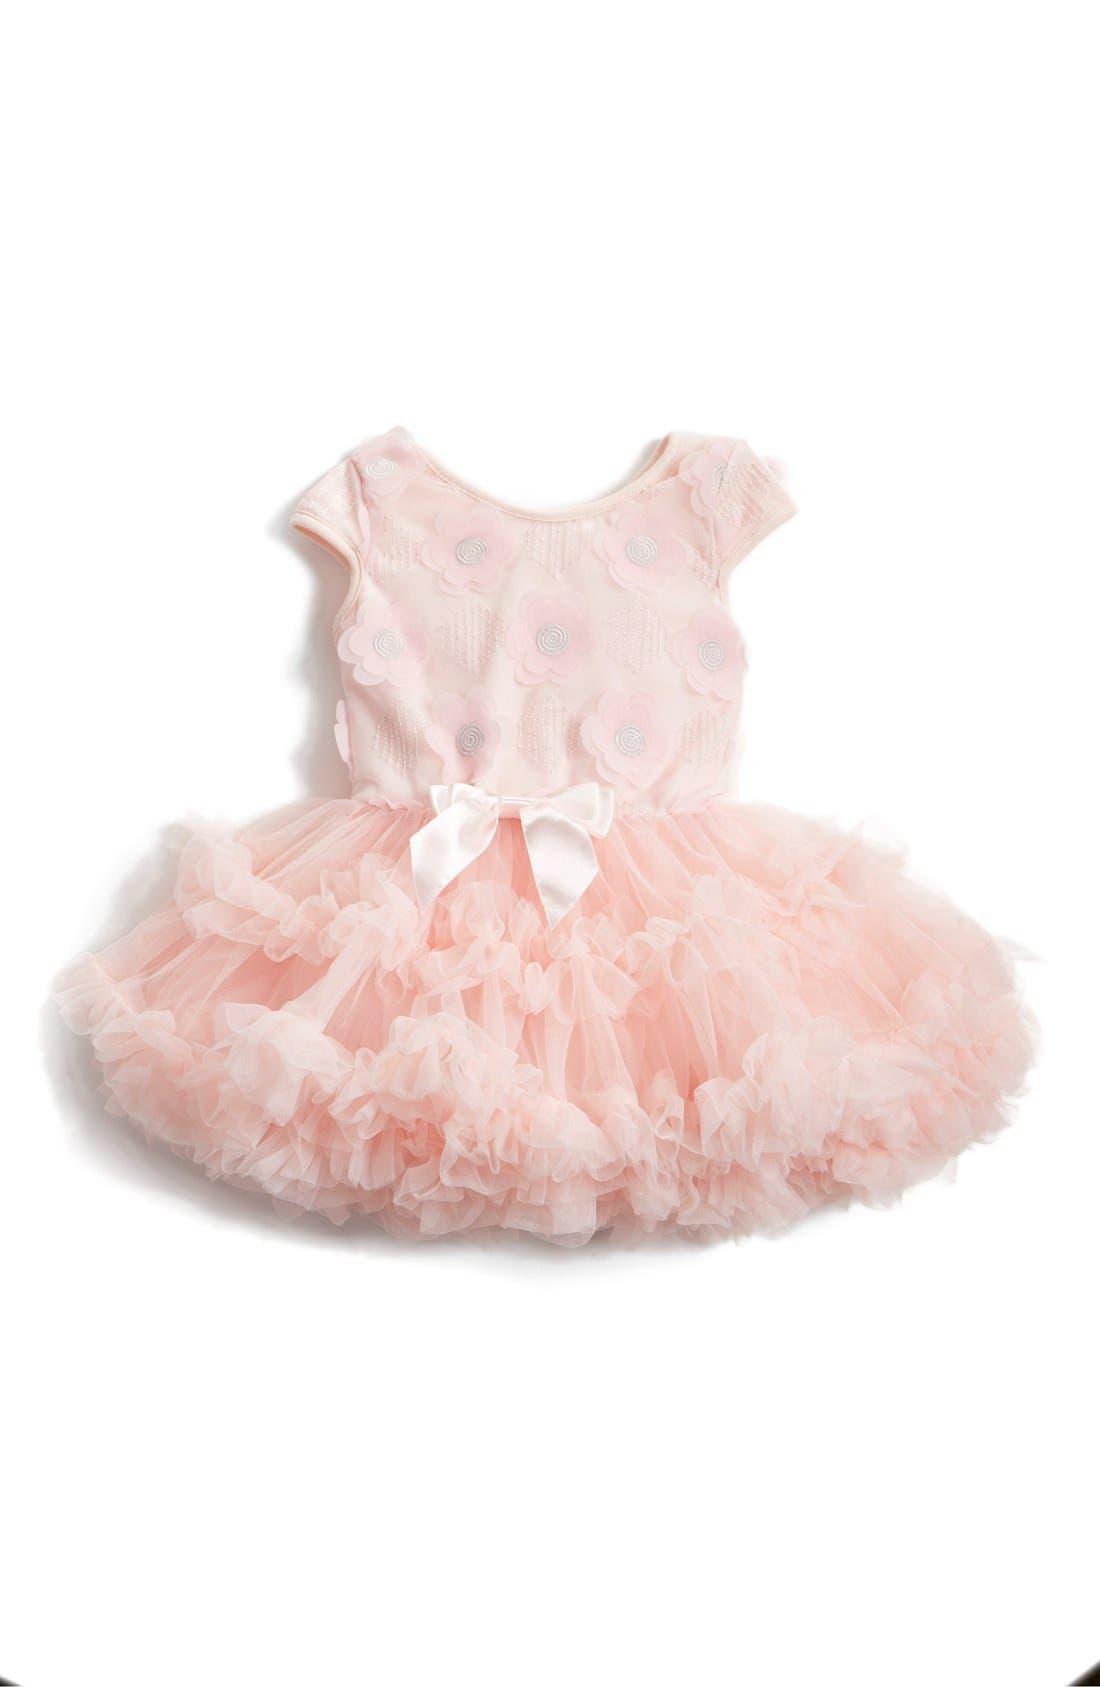 Main Image - Popatu Embroidered Flower Appliqué Pettidress (Baby Girls)